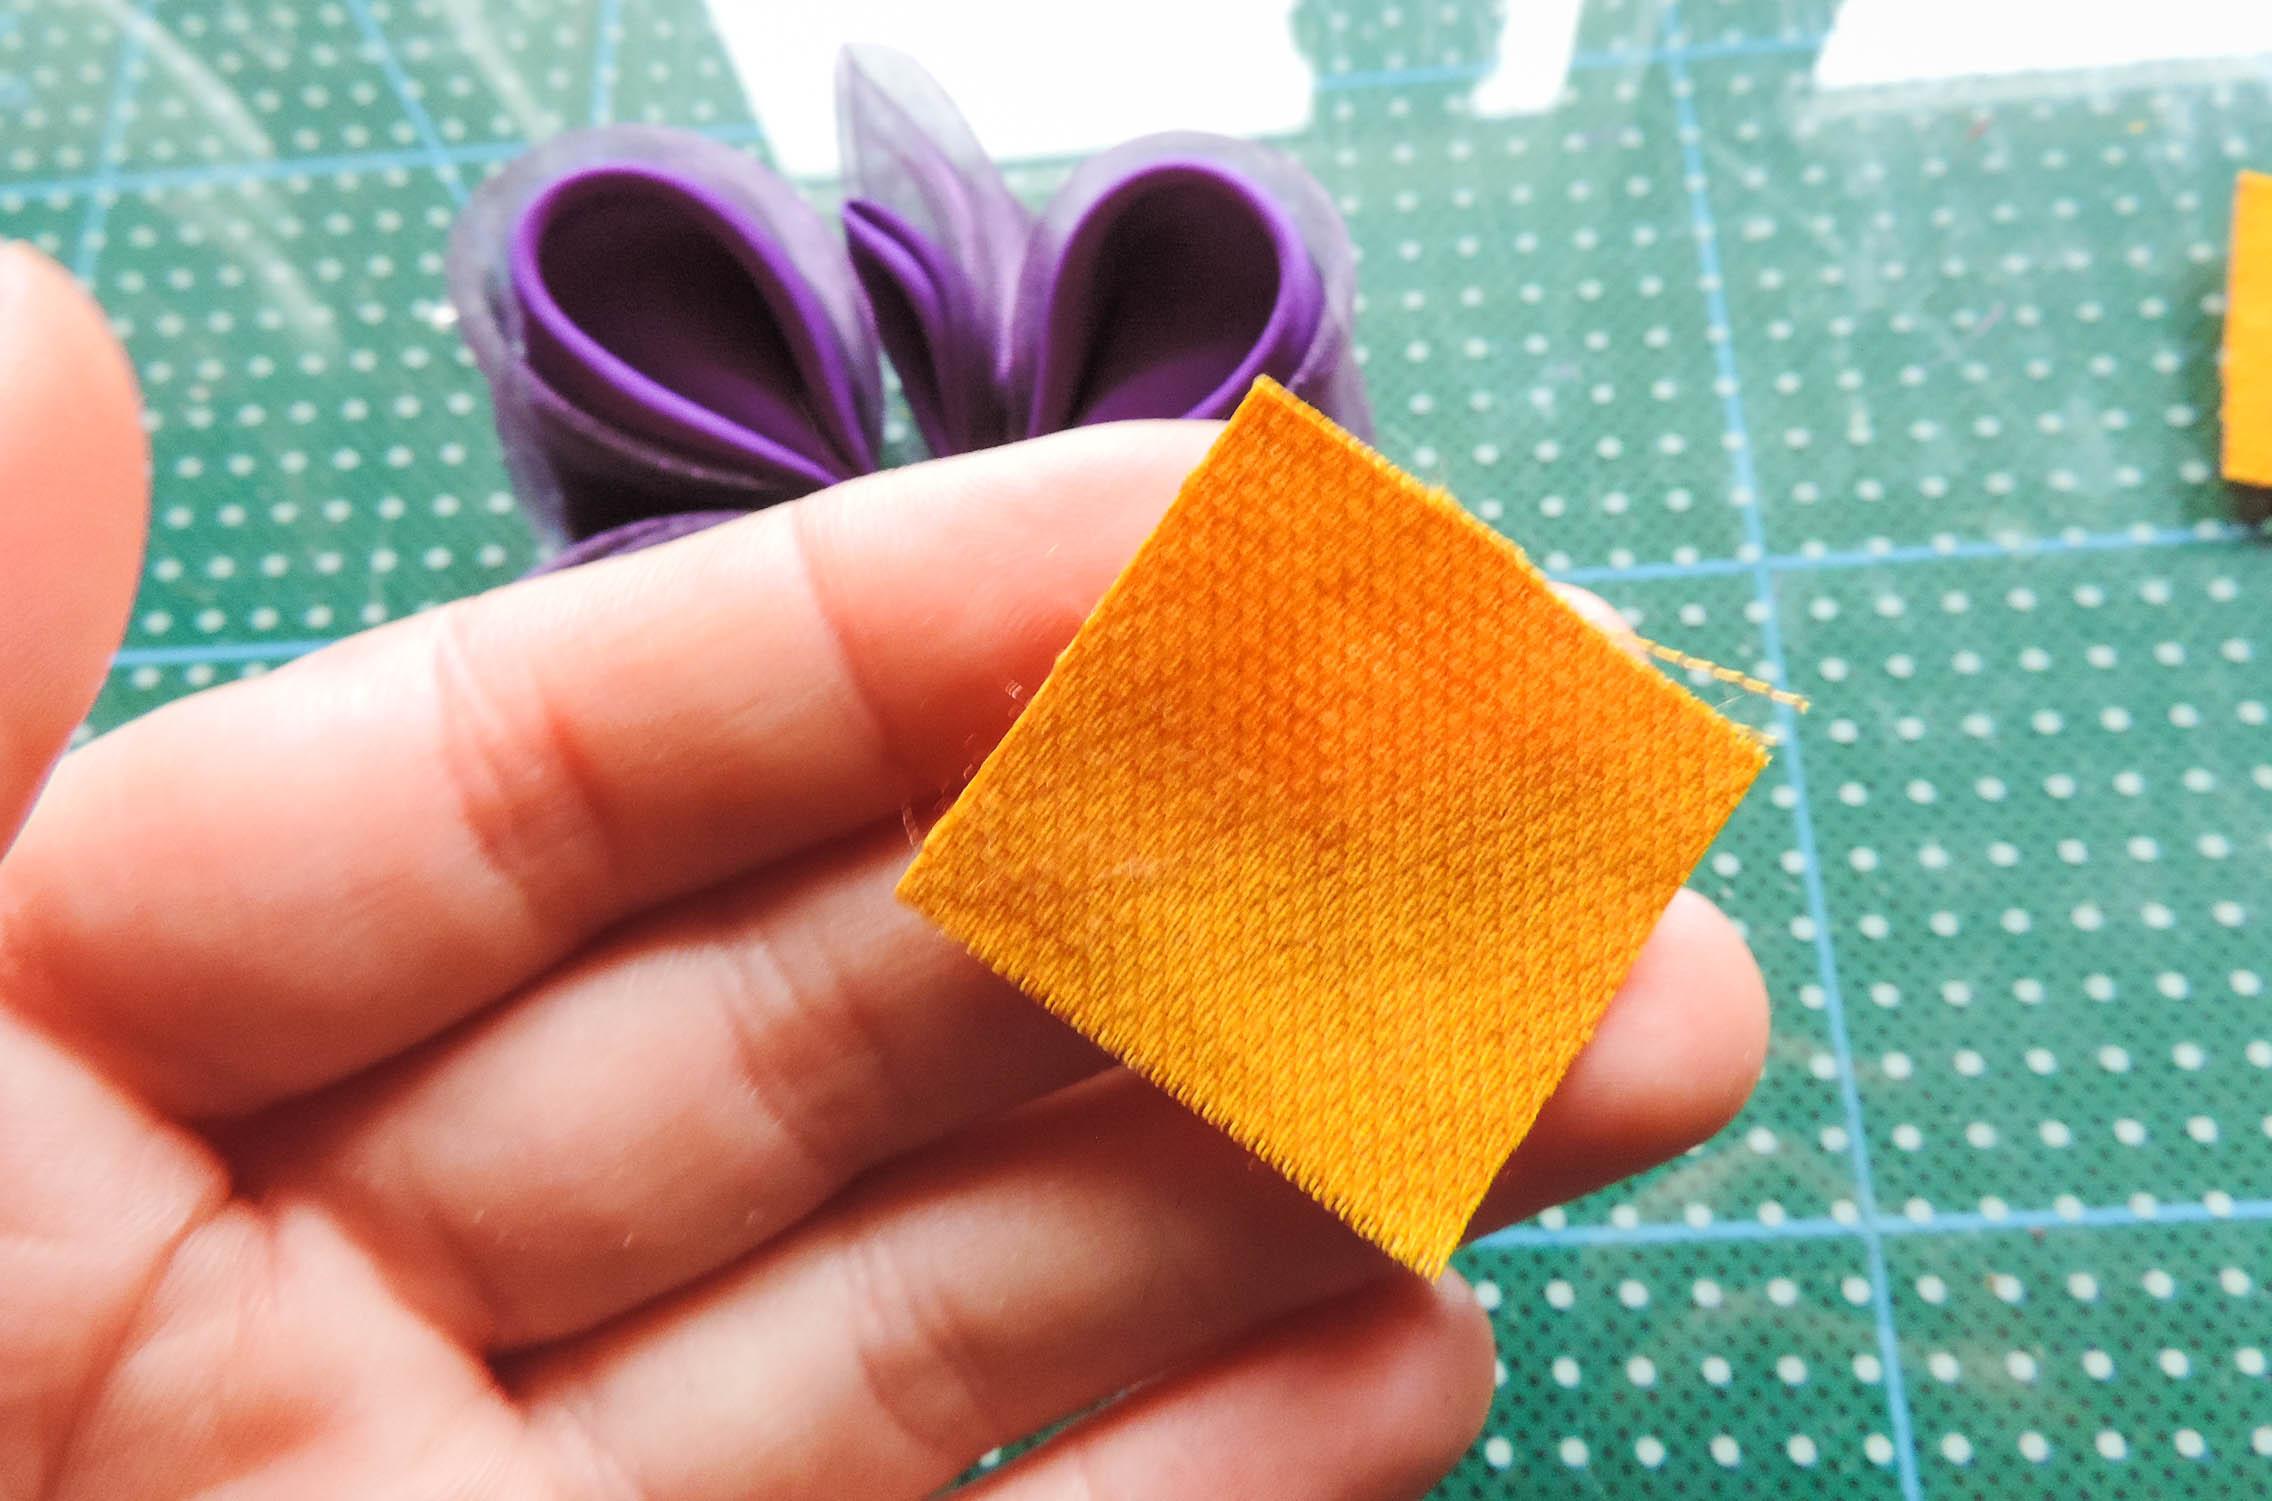 Iris flower tutorial - making the yellow petals 1